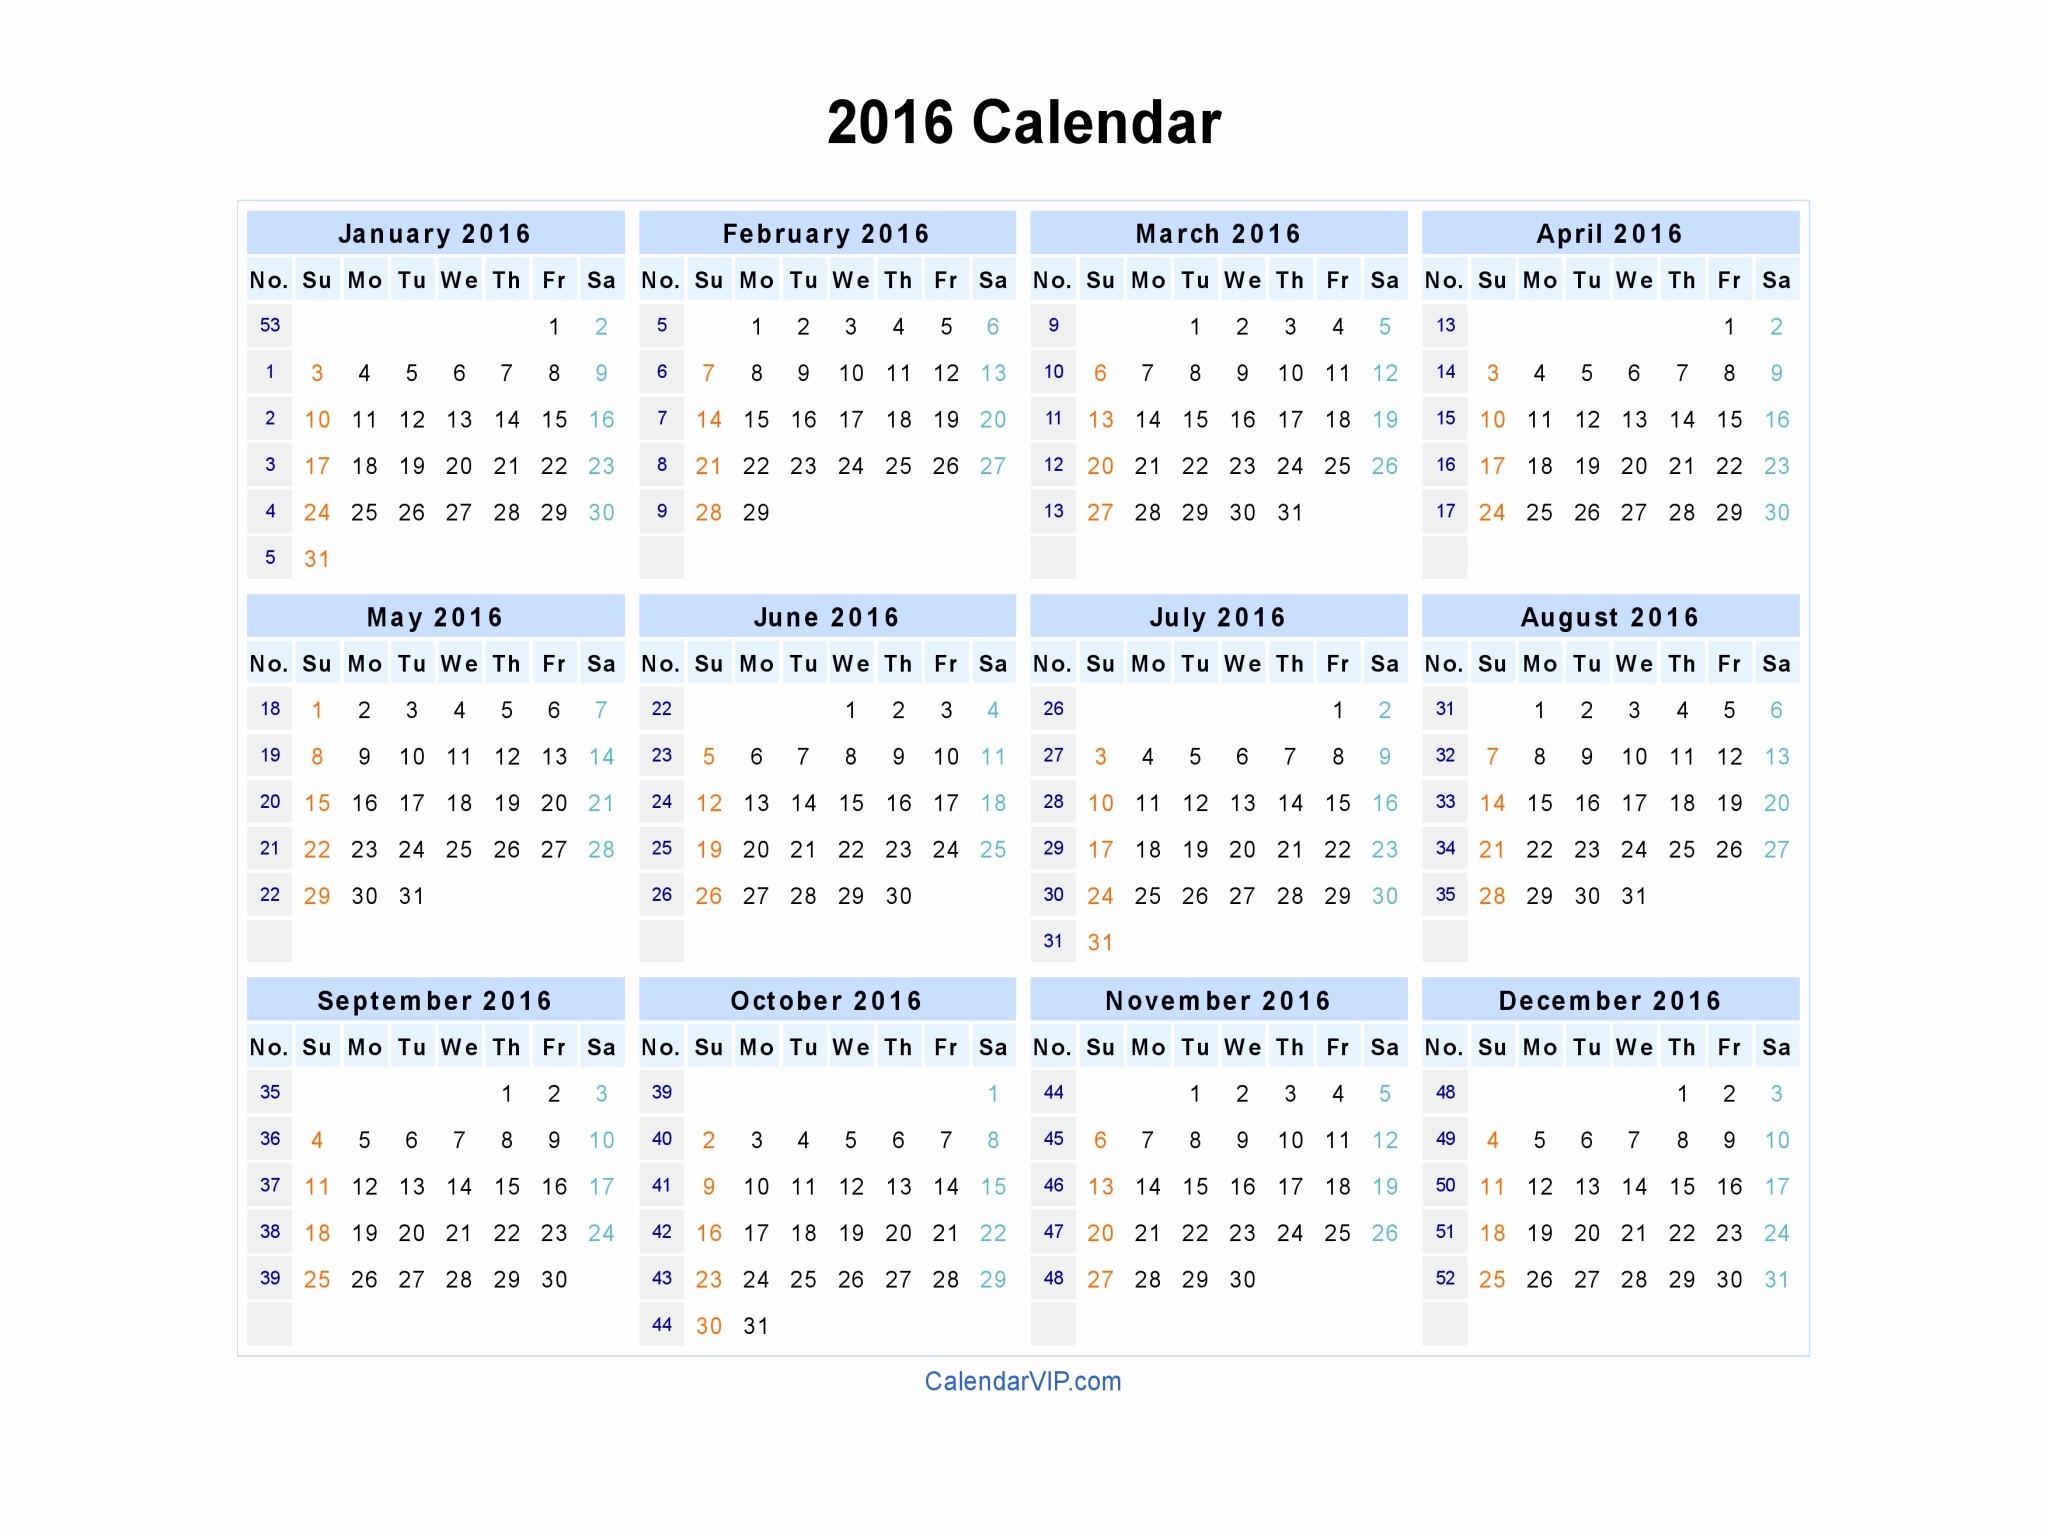 Excel 2016 Calendar with Holidays Elegant 2016 Calendar Blank Printable Calendar Template In Pdf